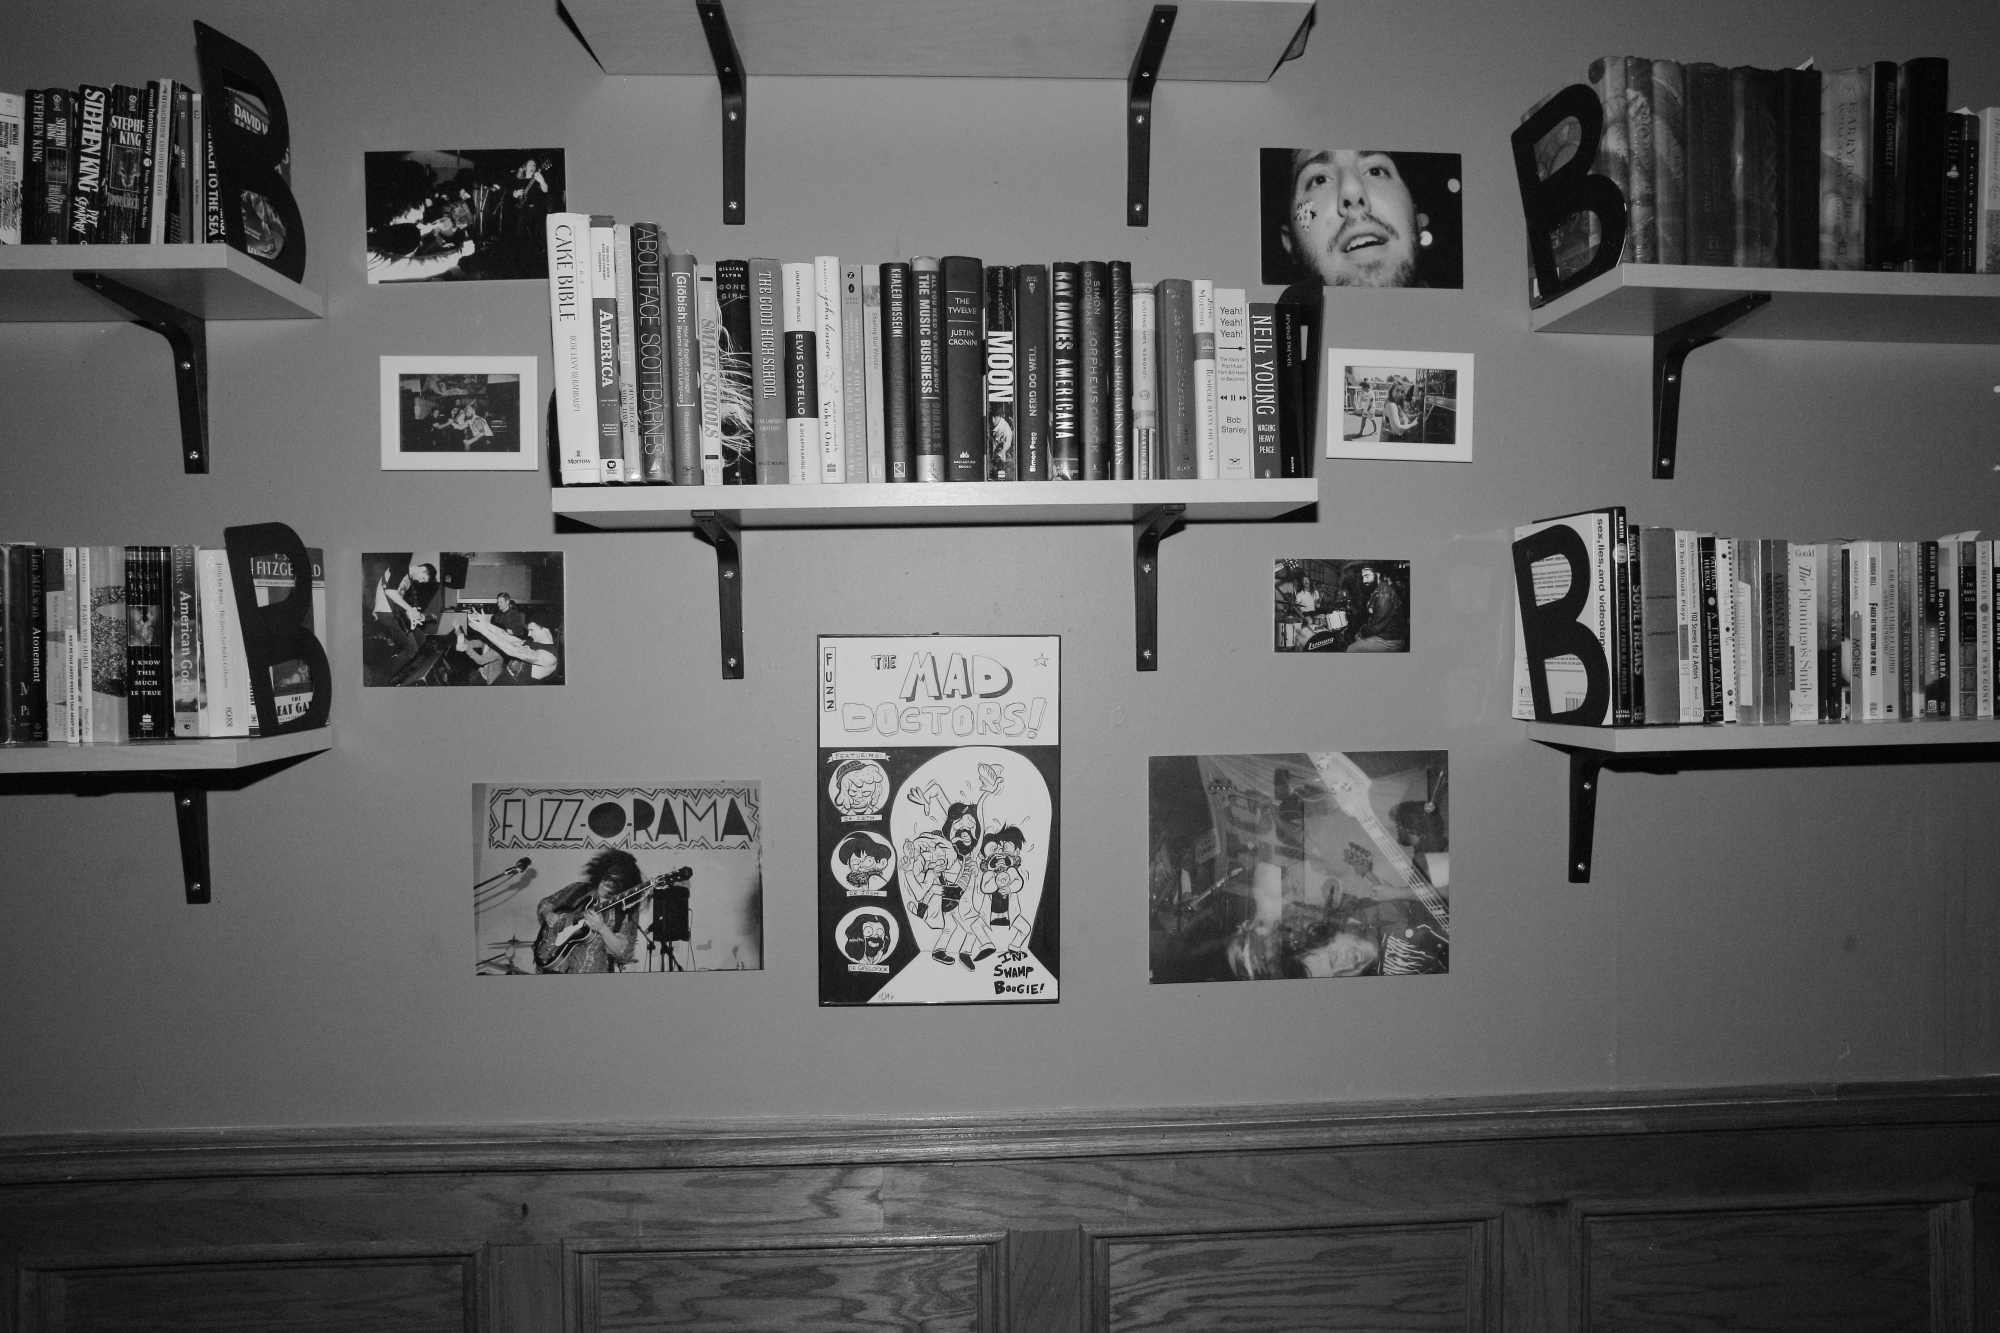 024_Wall02.JPG